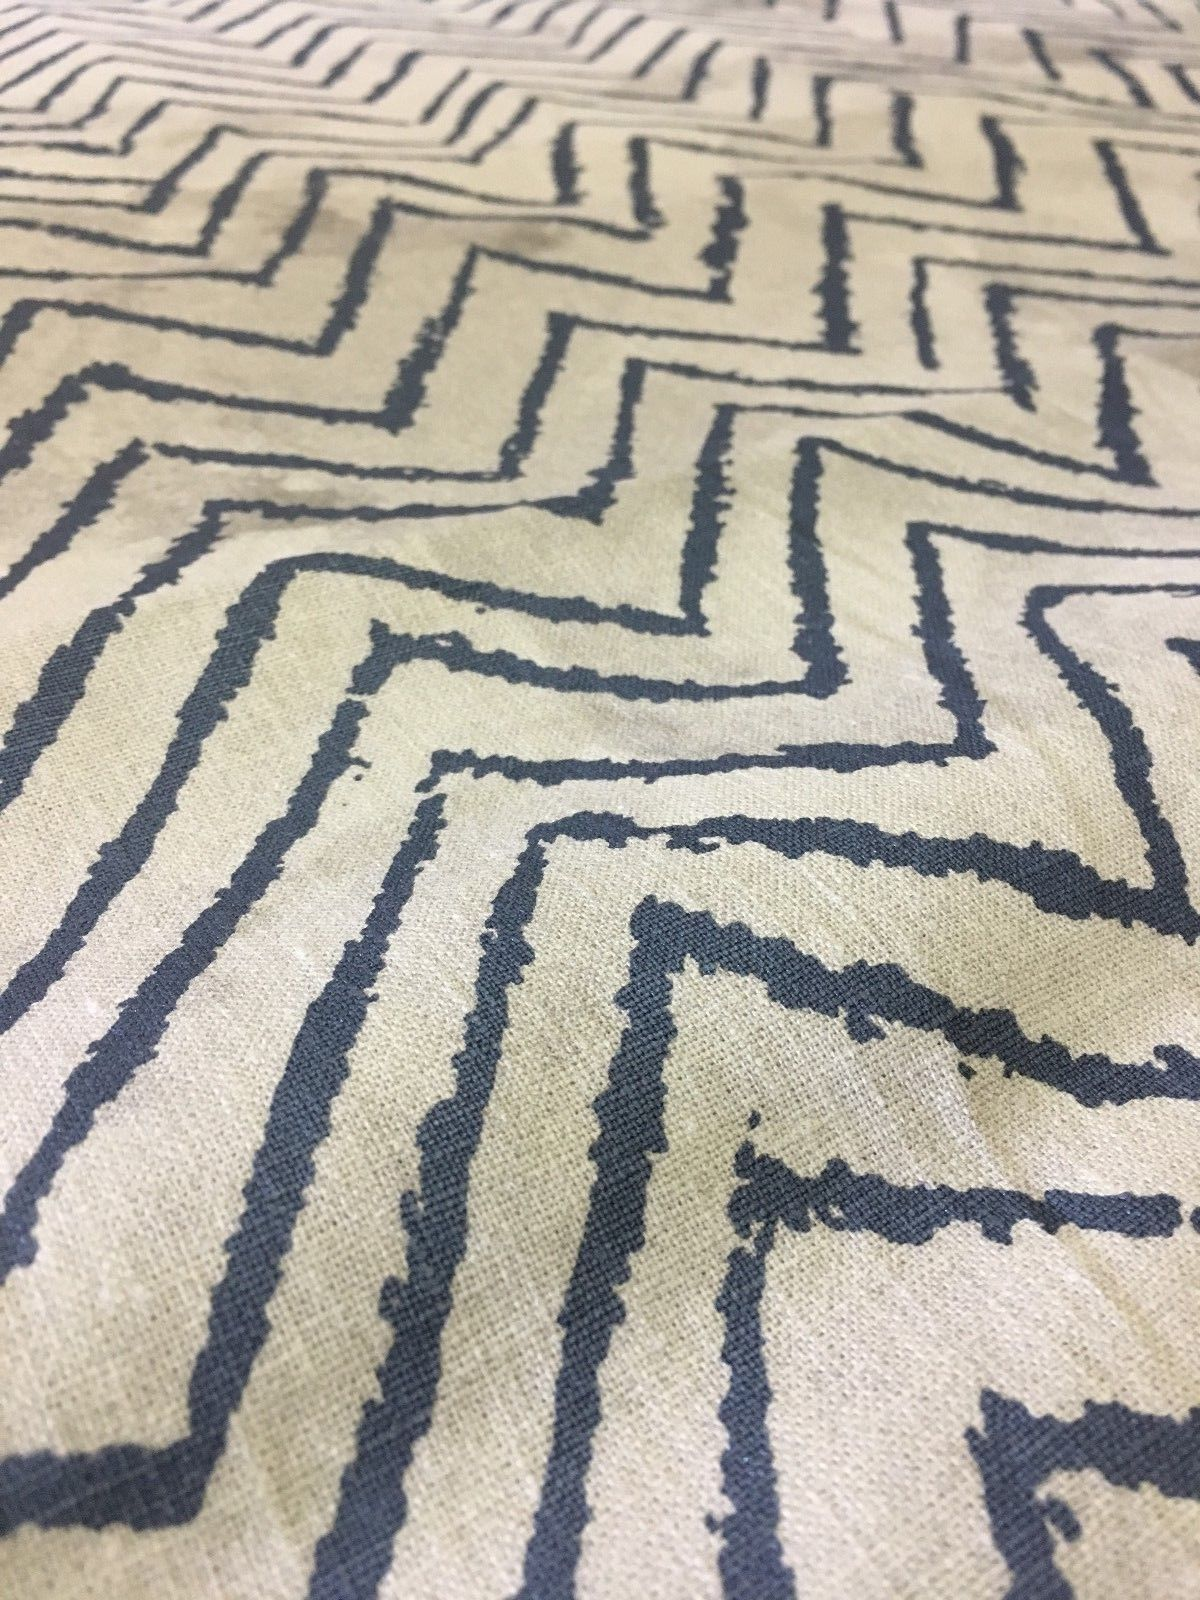 2.125 yds Lee Jofa Upholstery Fabric Serendipity Chevron Print 3517.15.0 RQ